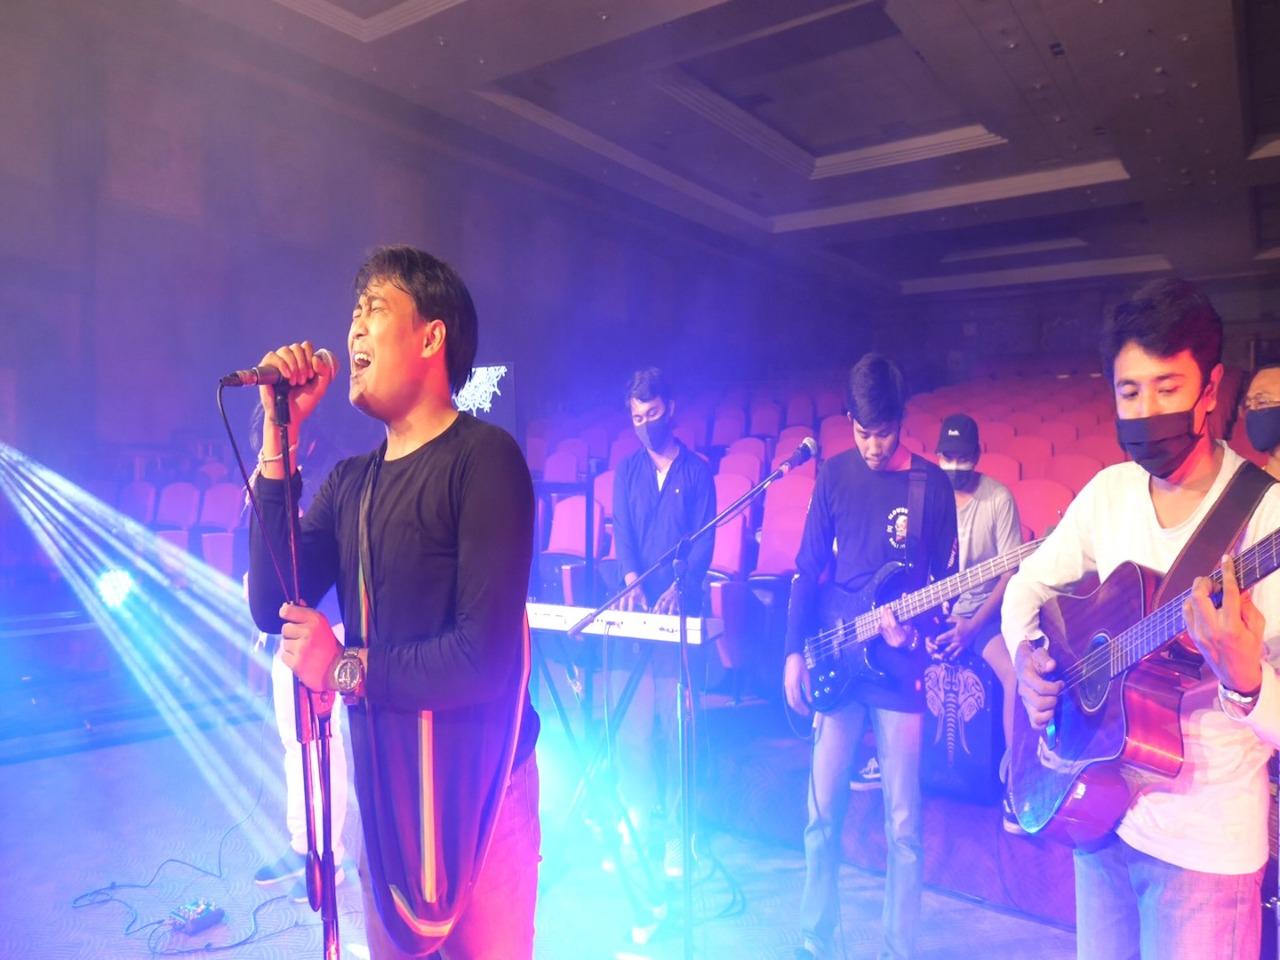 Imagine Rainbow Warnai Denpasar Young Creative, Denfest Ke-13